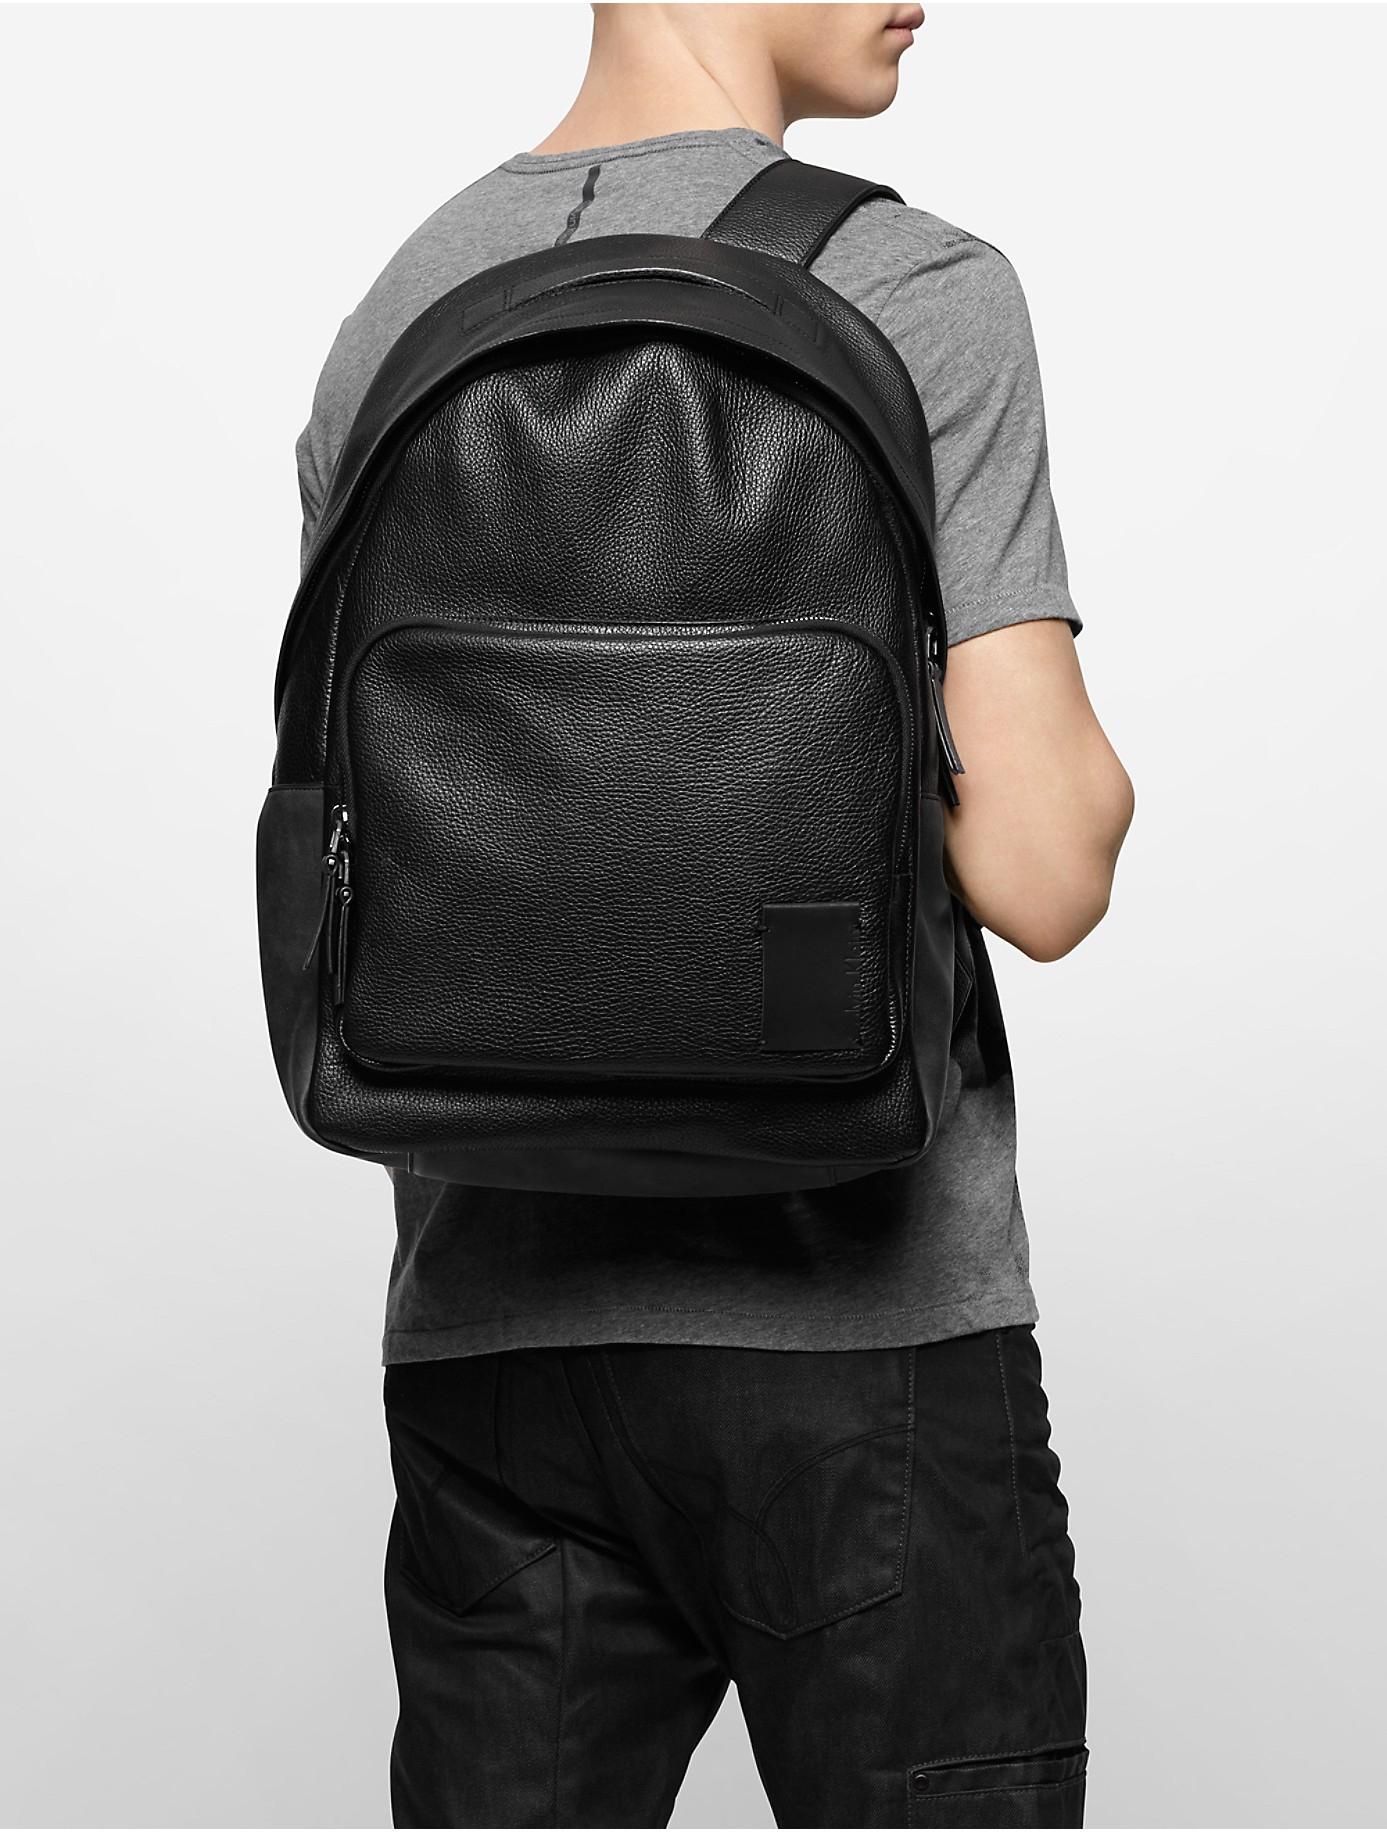 calvin klein jeans pebble textured leather backpack in. Black Bedroom Furniture Sets. Home Design Ideas